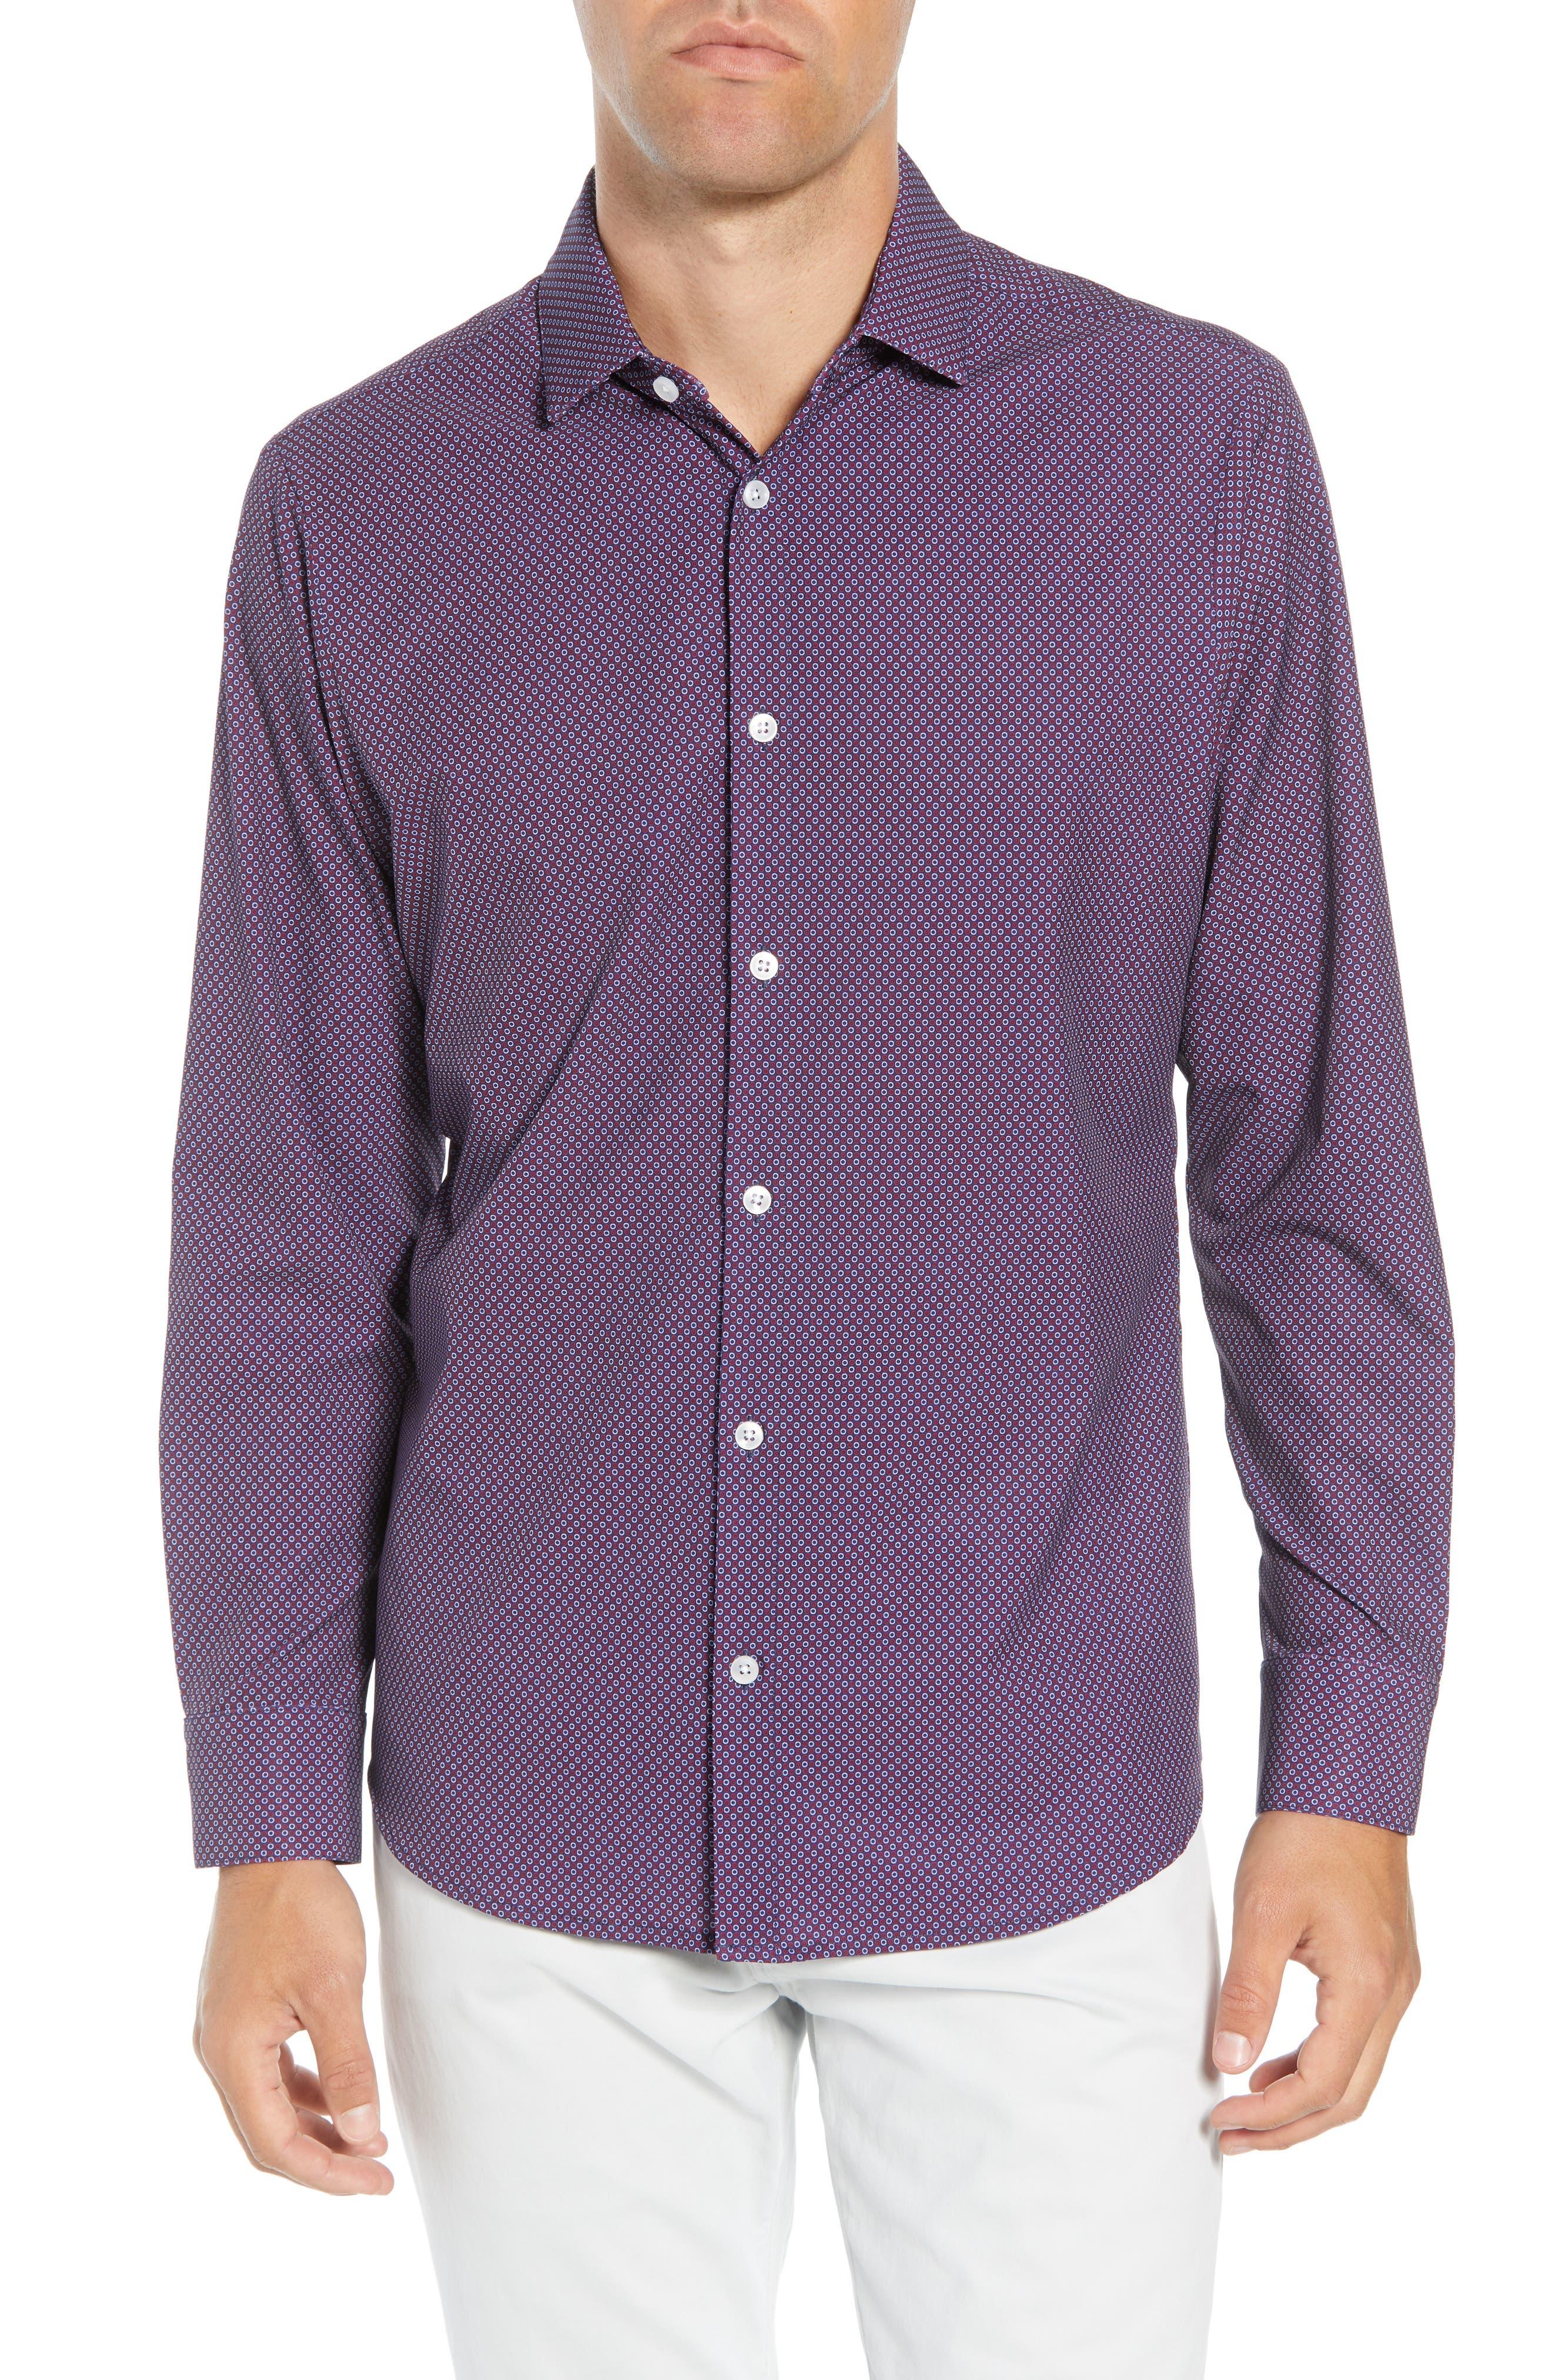 Damon Regular Fit Print Performance Sport Shirt, Main, color, PLUM